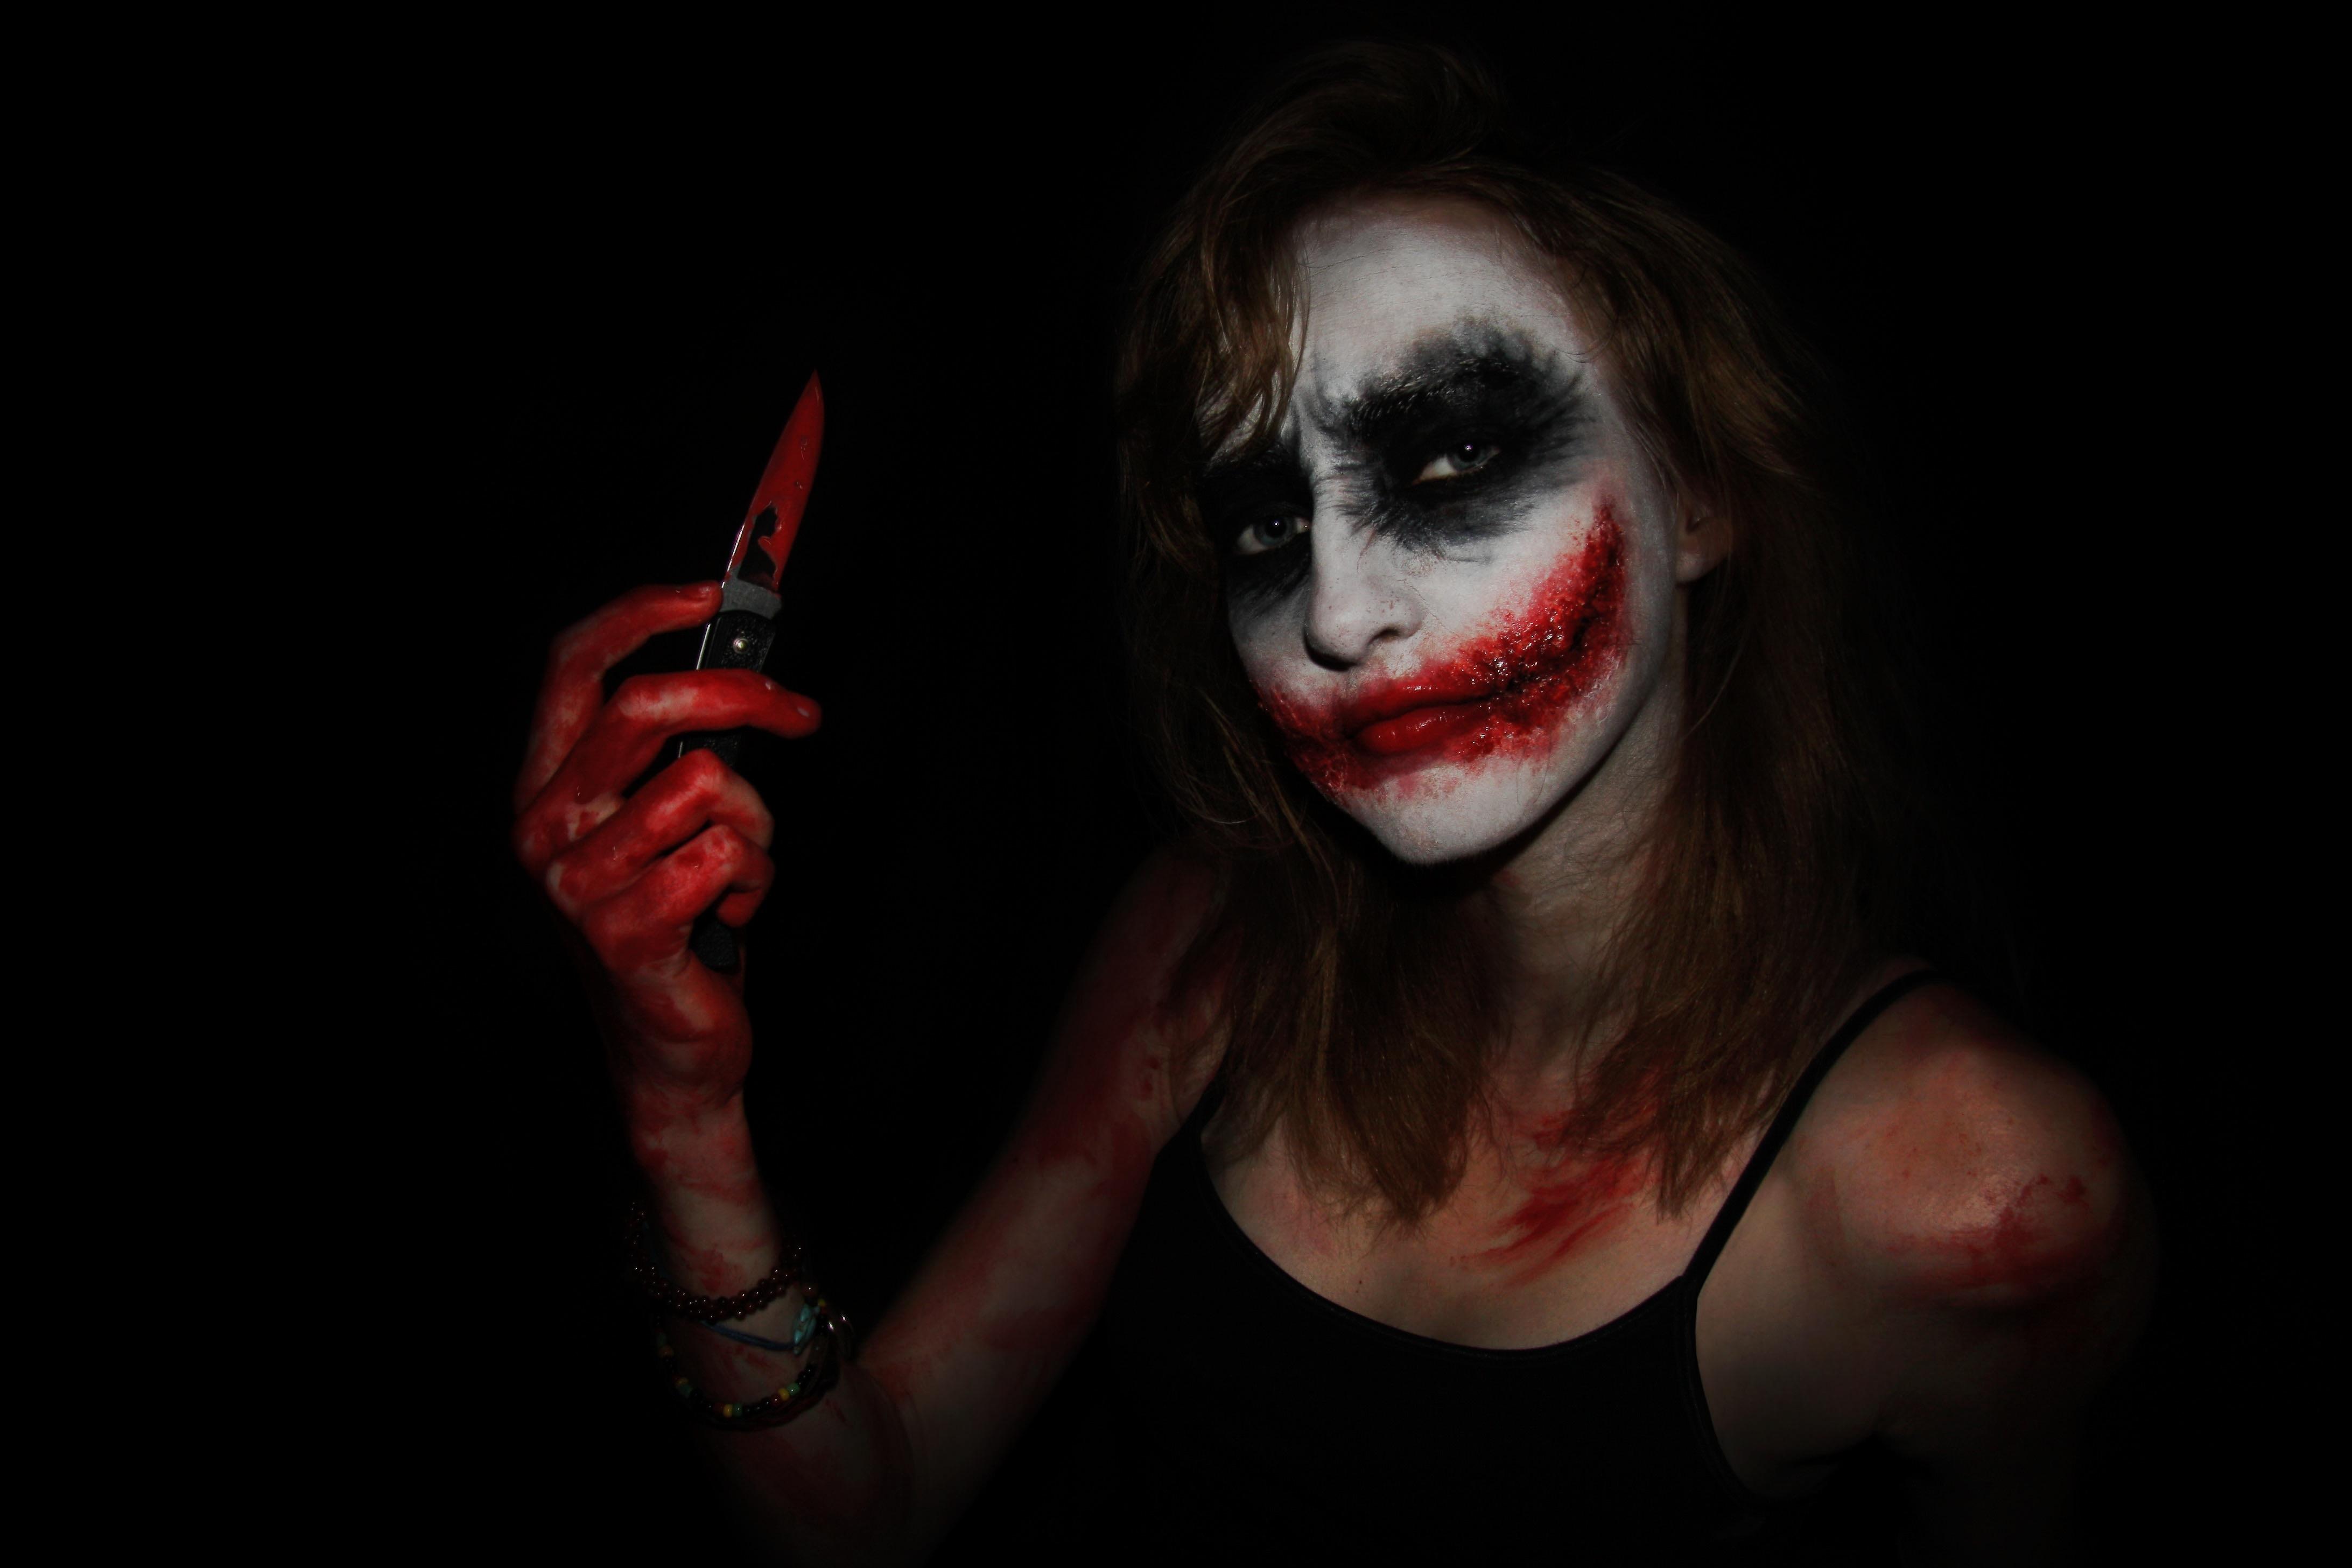 Wallpaper Face Painting Portrait Creepy Makeup Halloween Joker Canon Blood Knife Gore Psycho Gross Shadows Scary Serious Paint Selfie